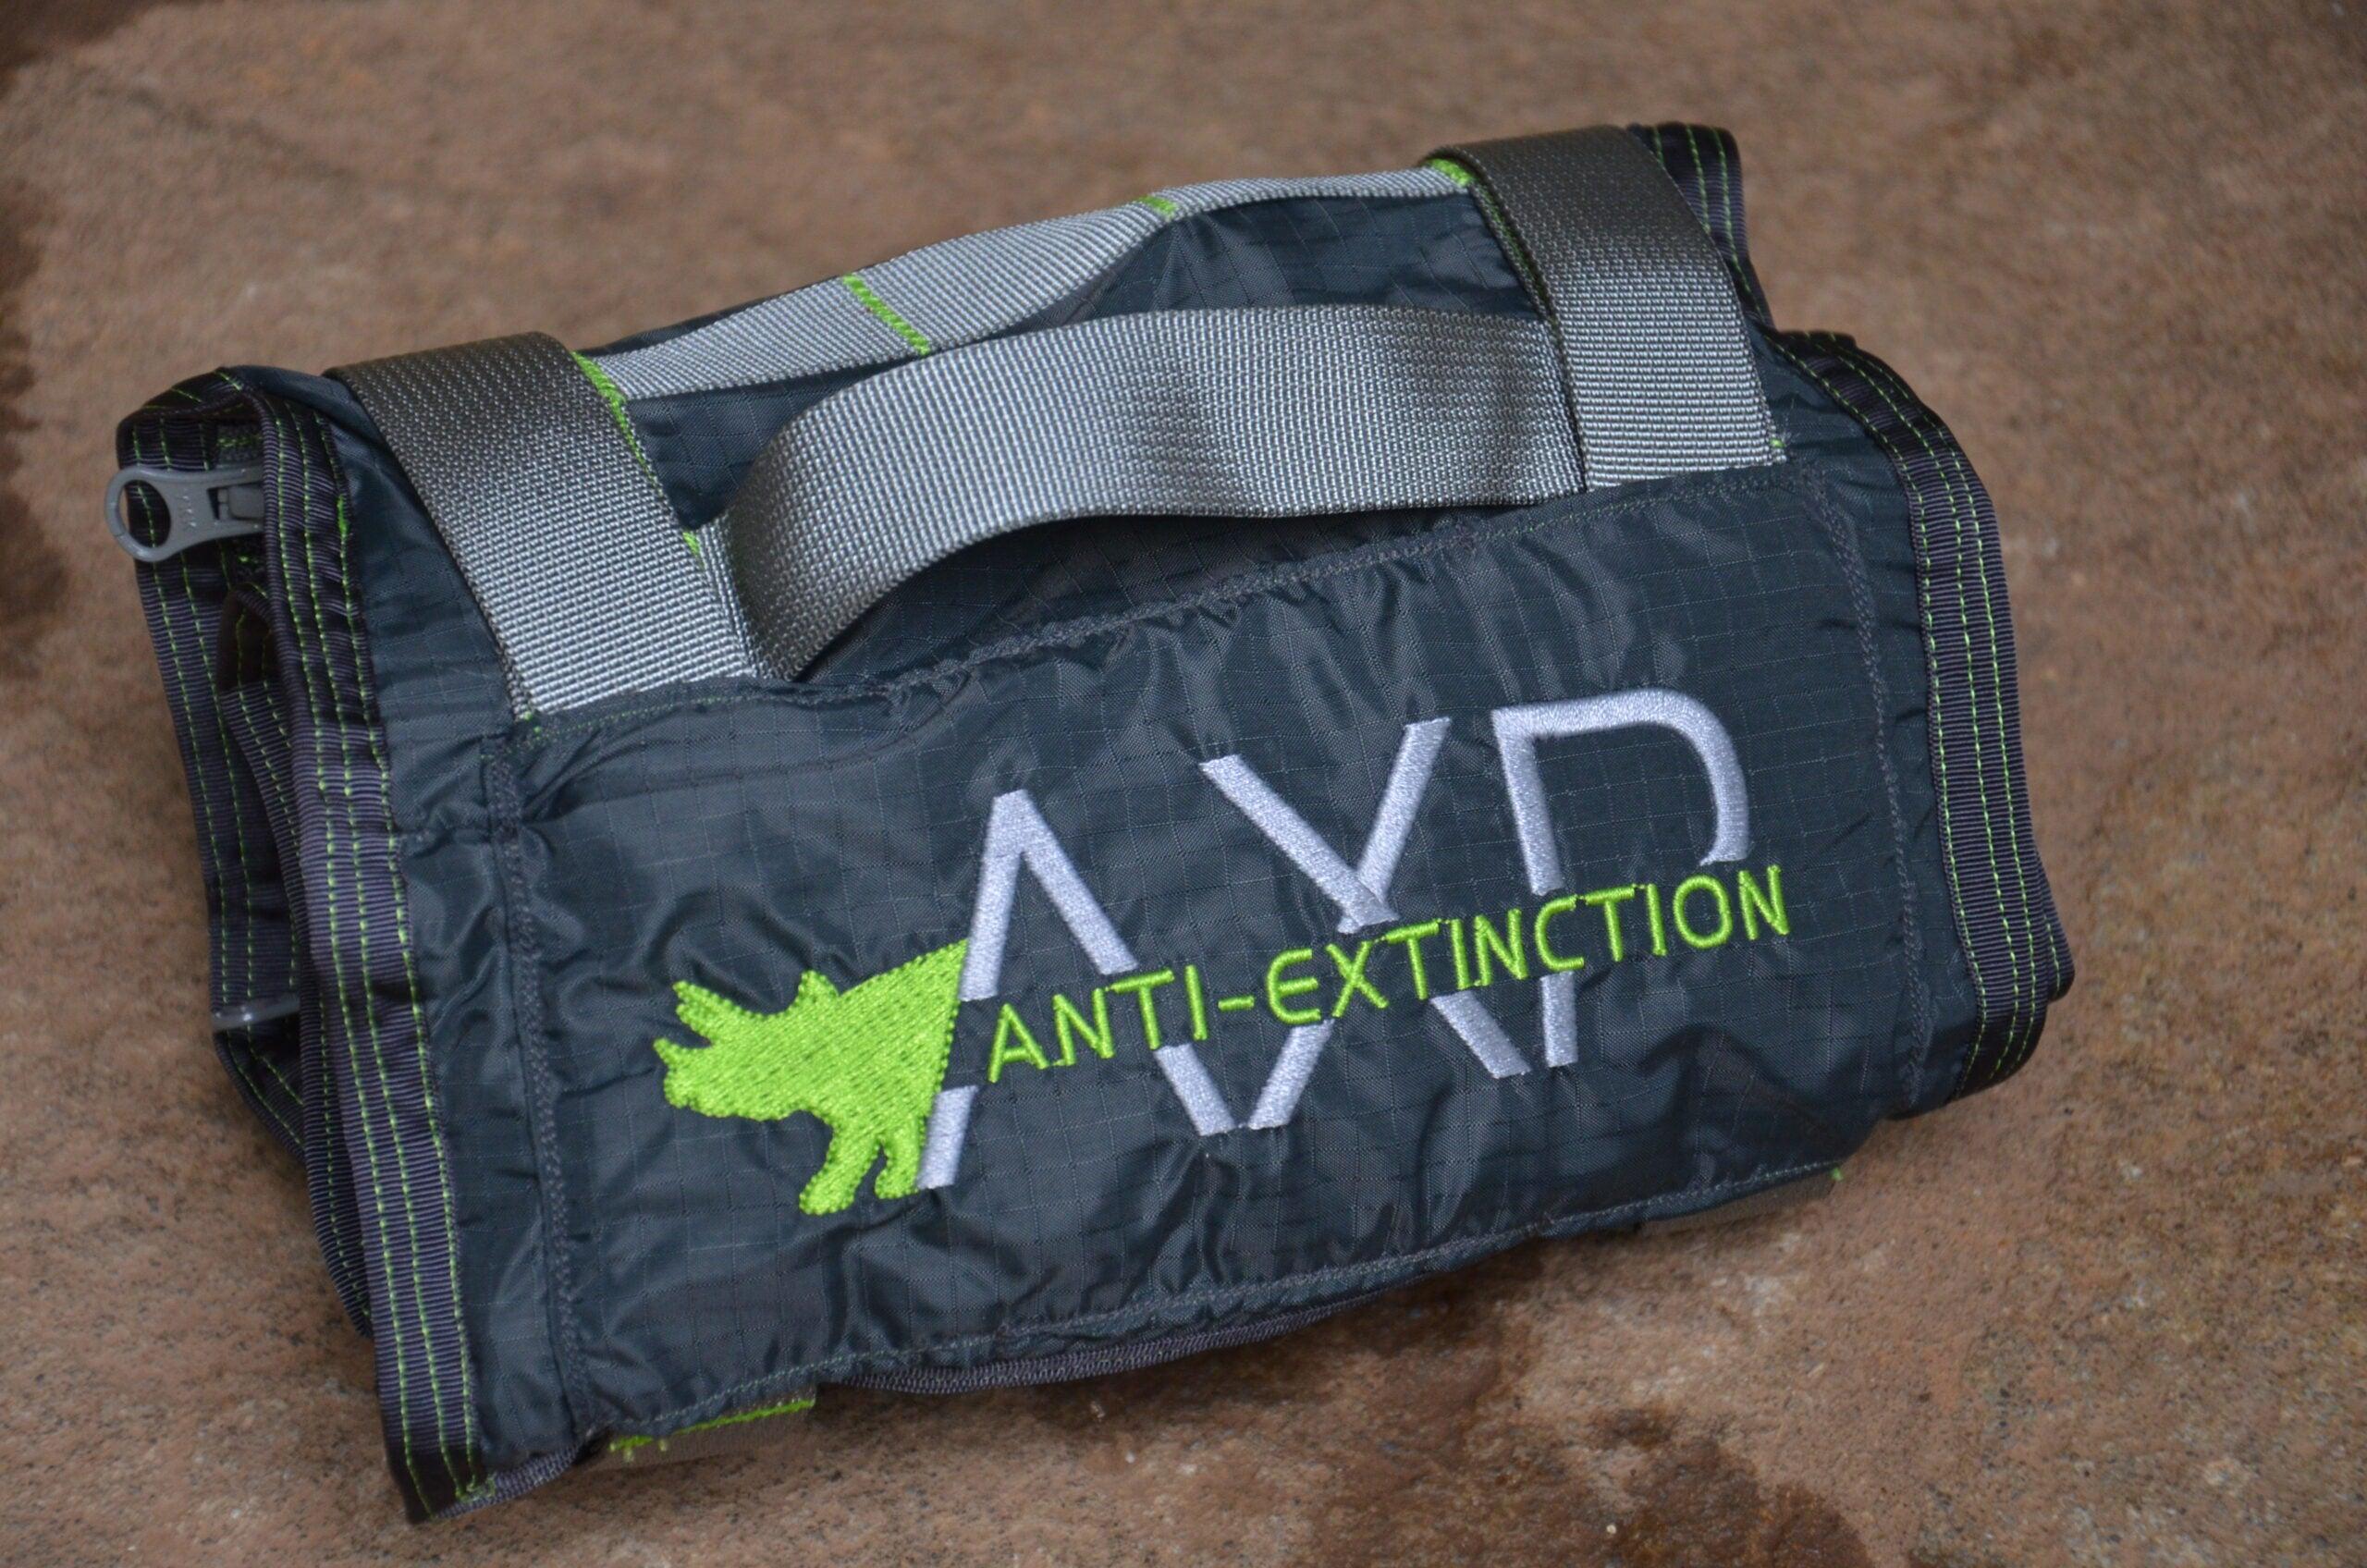 Gear Review: AXP Wilderness Survival Kit